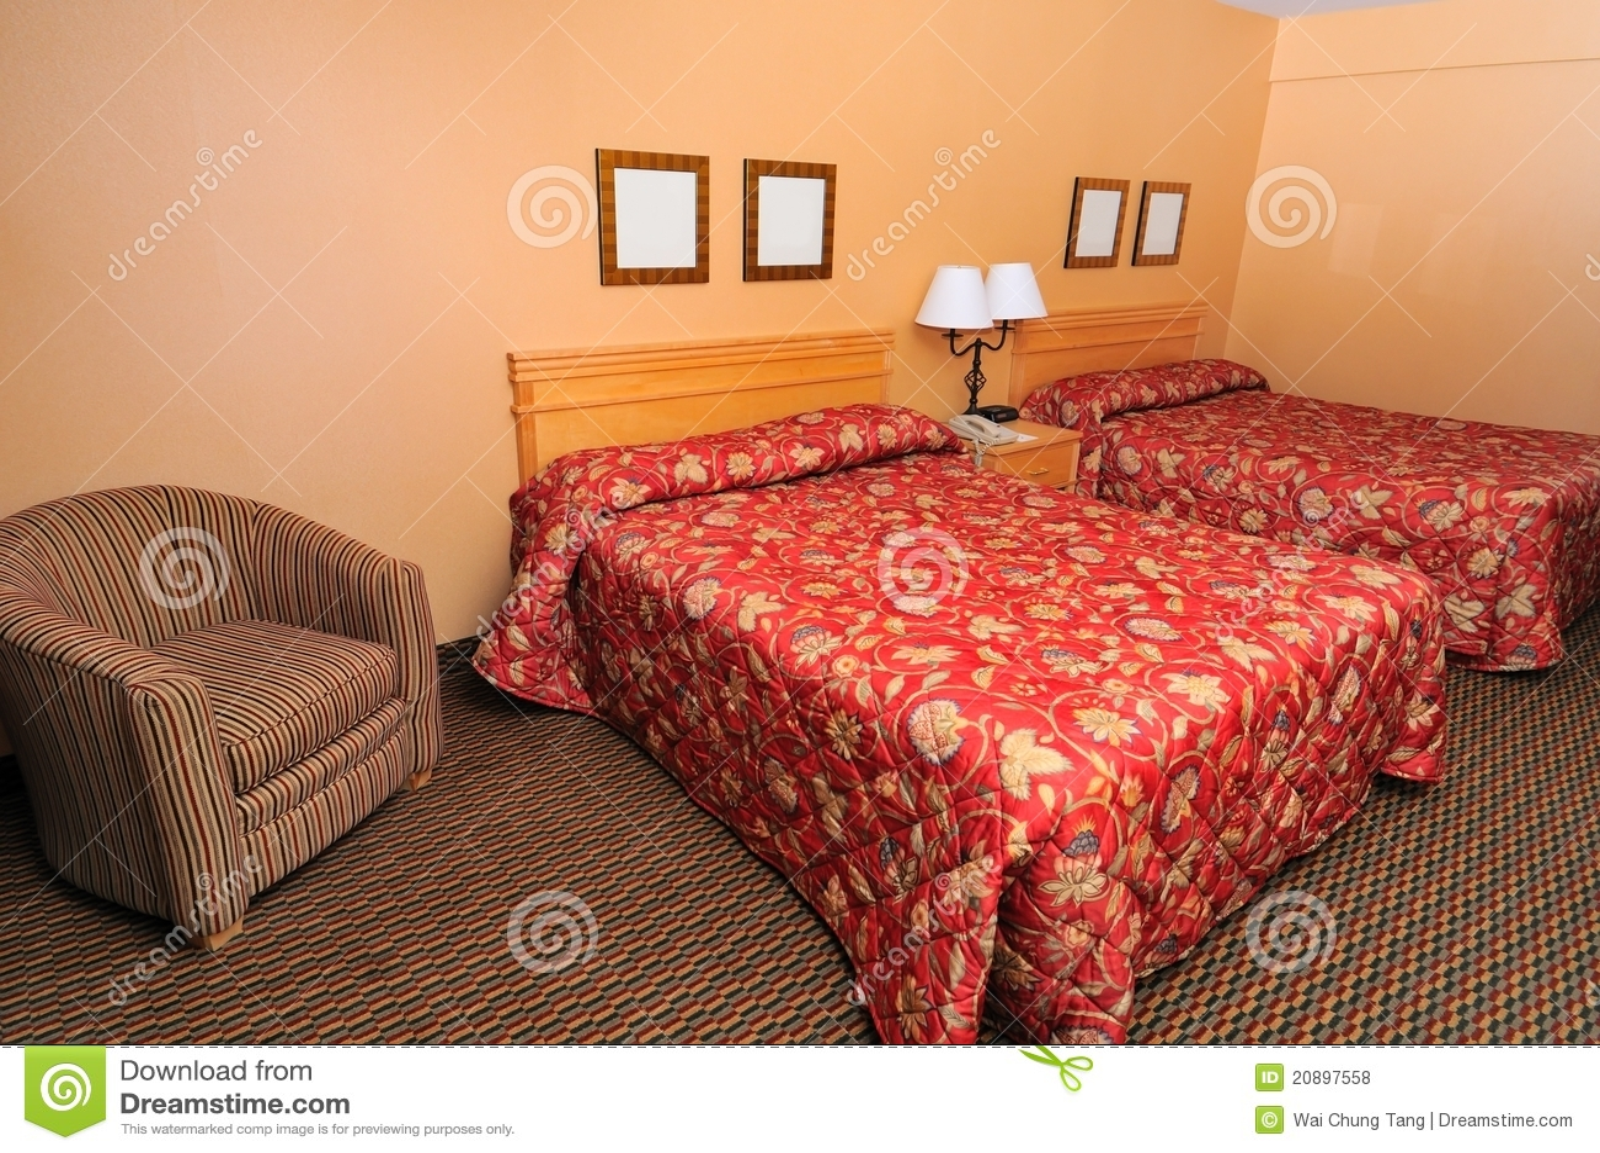 Simple Cozy Bedroom Royalty Free Stock Photos Image